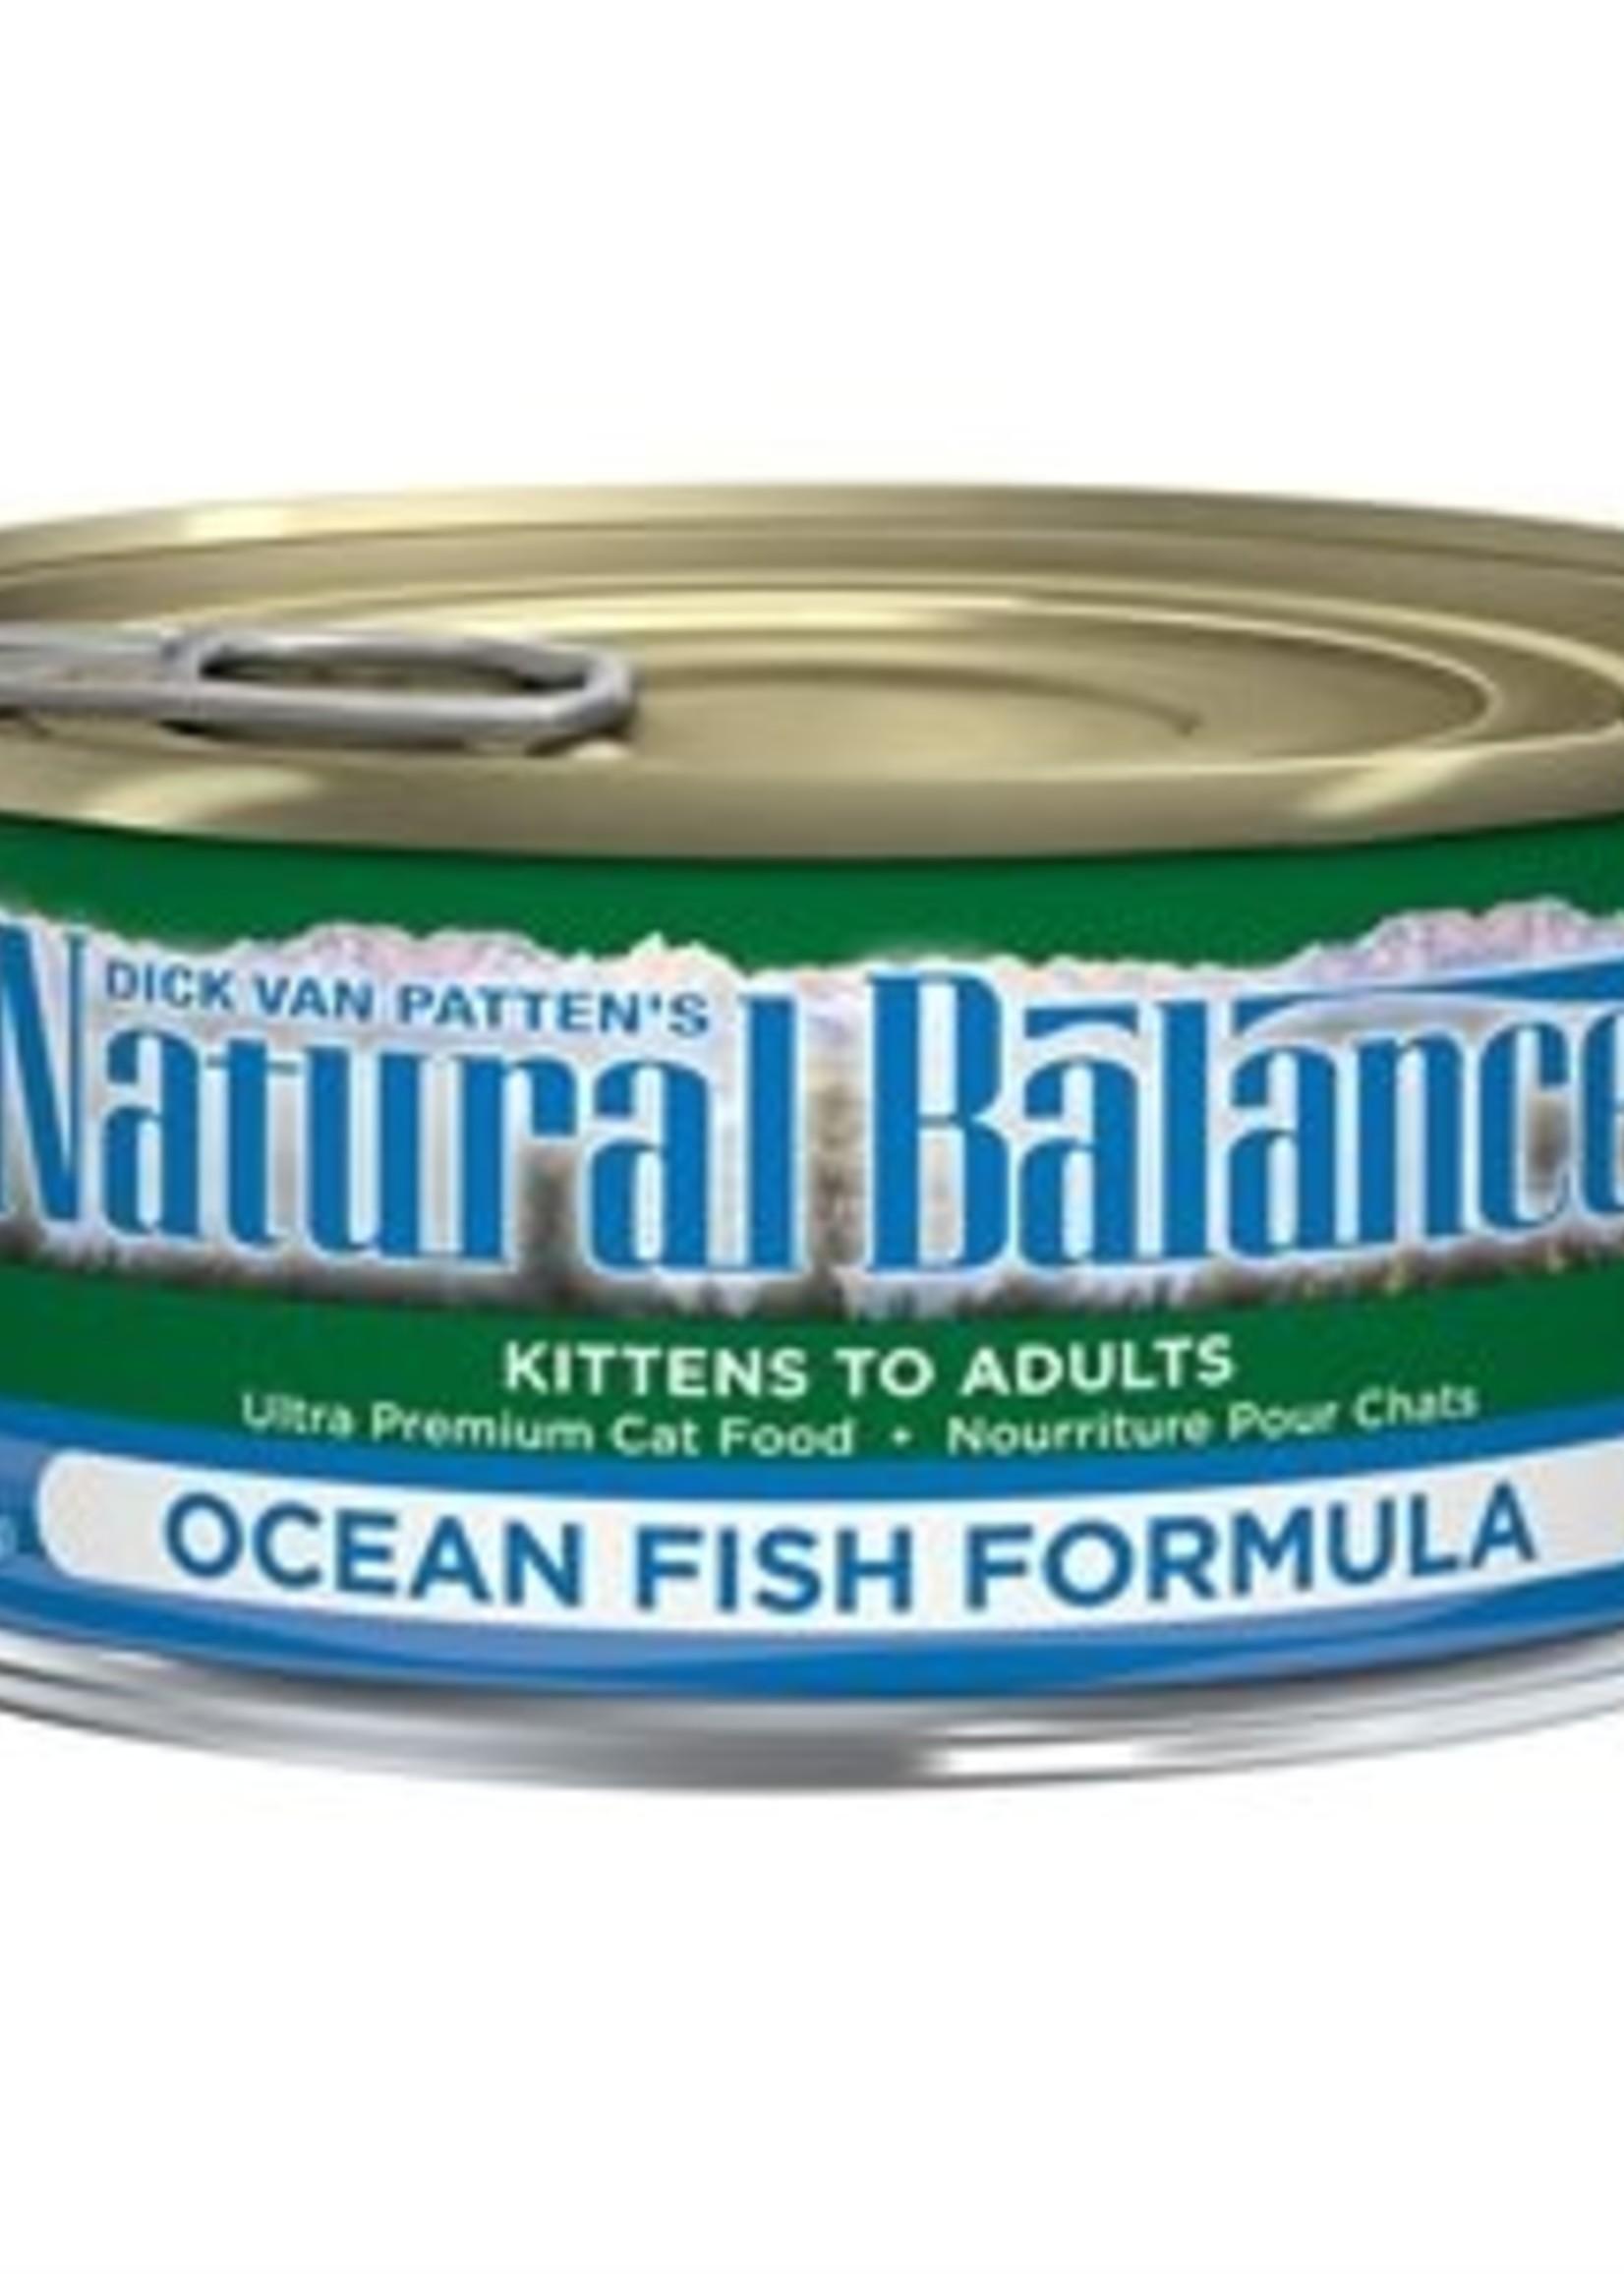 Natural Balance® NATURAL BALANCE OCEAN FISH FORMULA 5.5oz